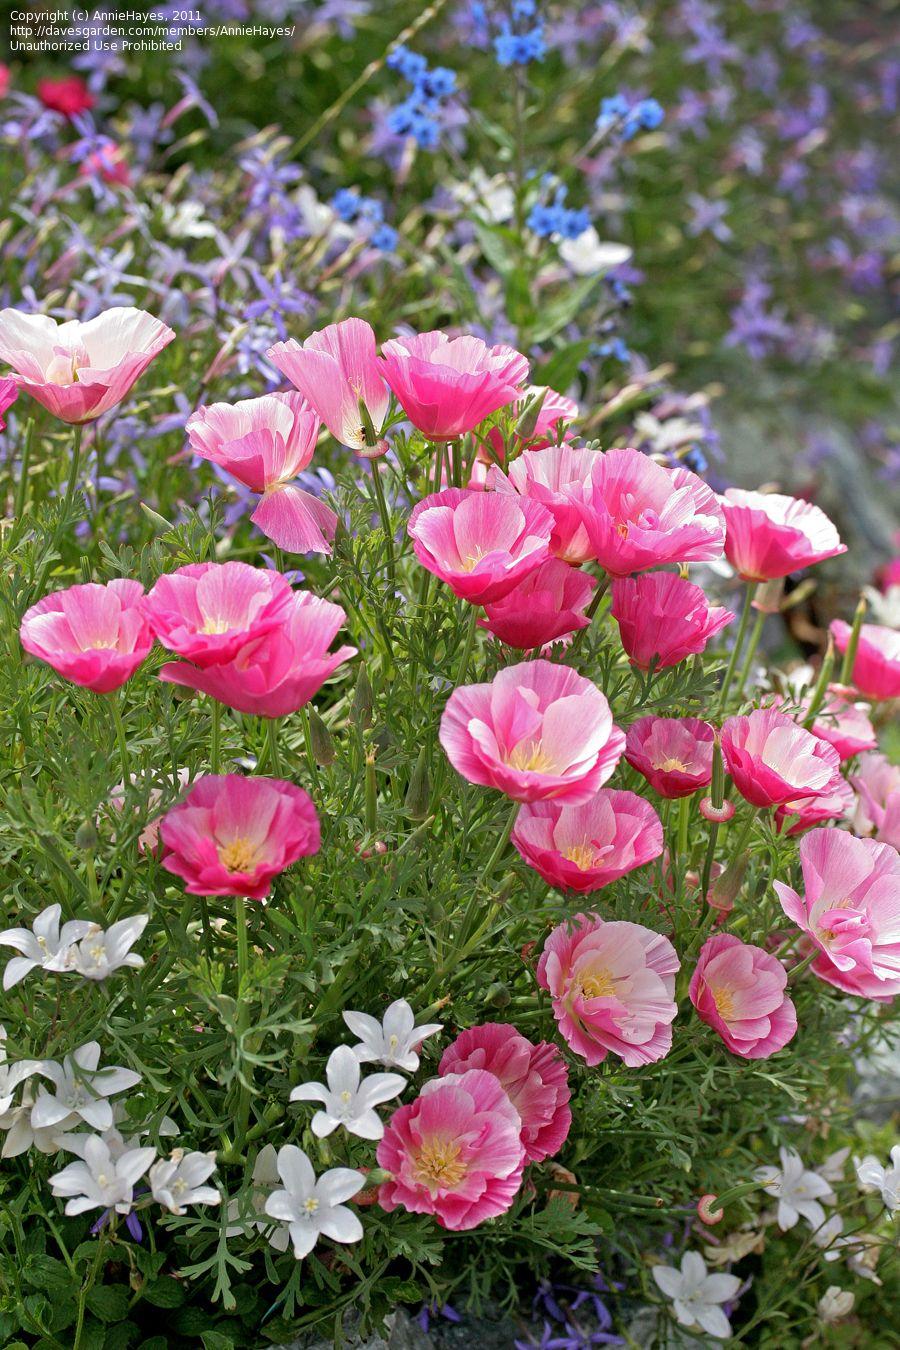 Pin By Tarja Huczkowski On Tarjas Pictures Pinterest Flowers